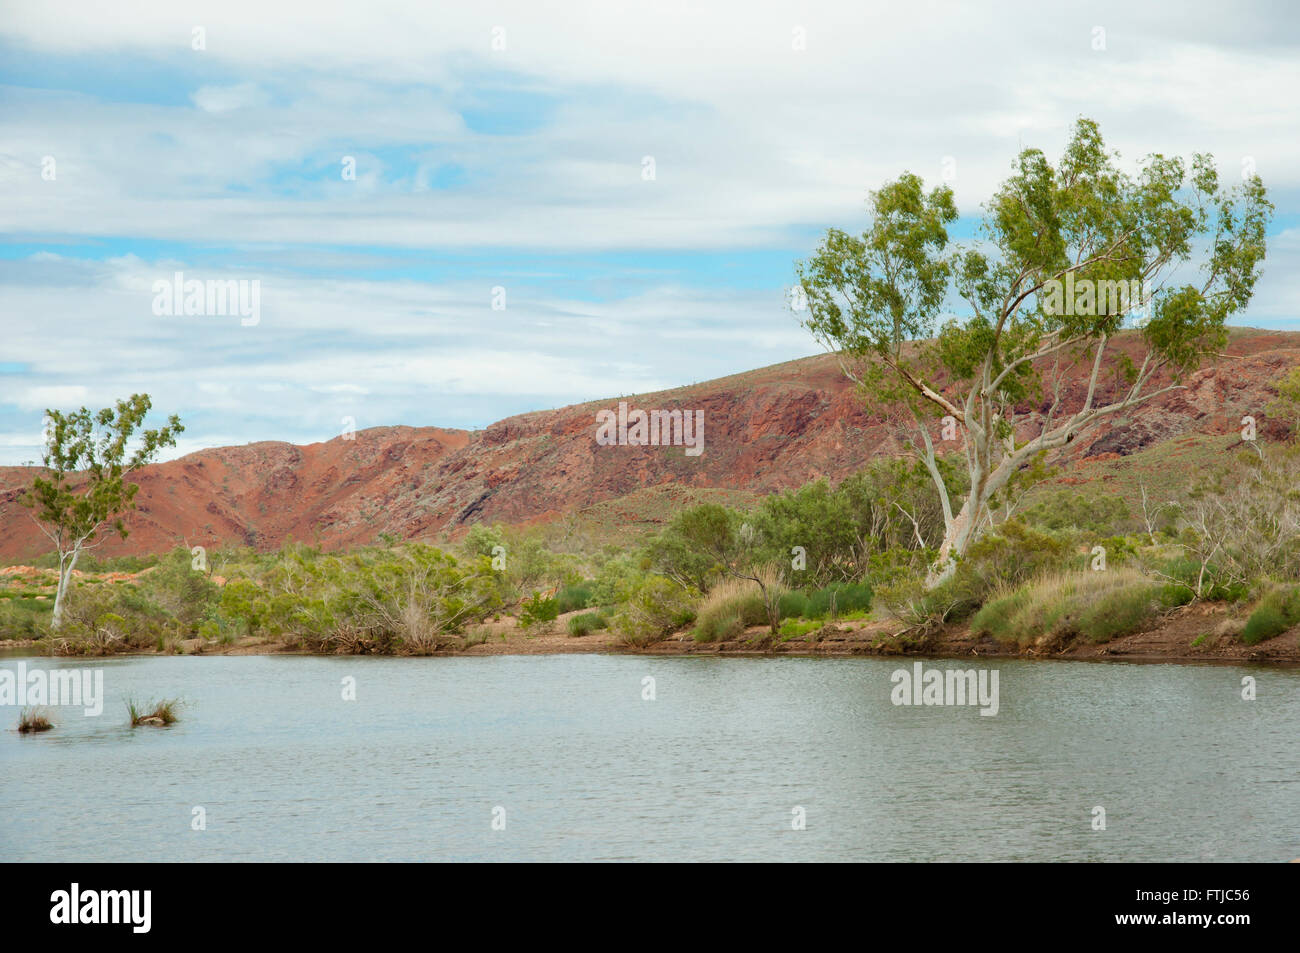 Billabong - Australia - Stock Image